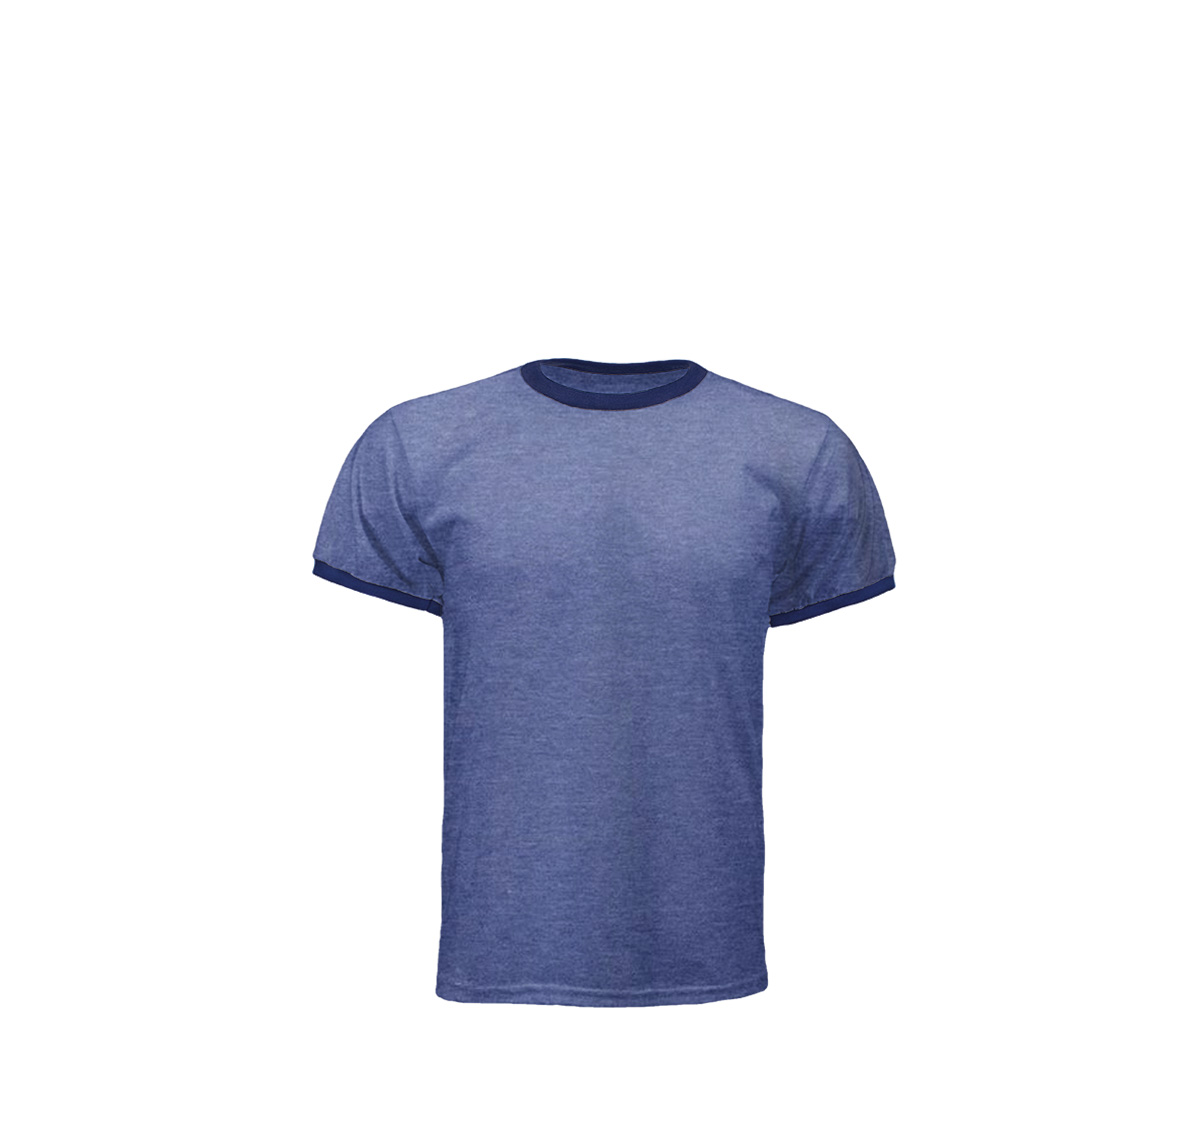 Shirt design on sleeve - 7 Colors